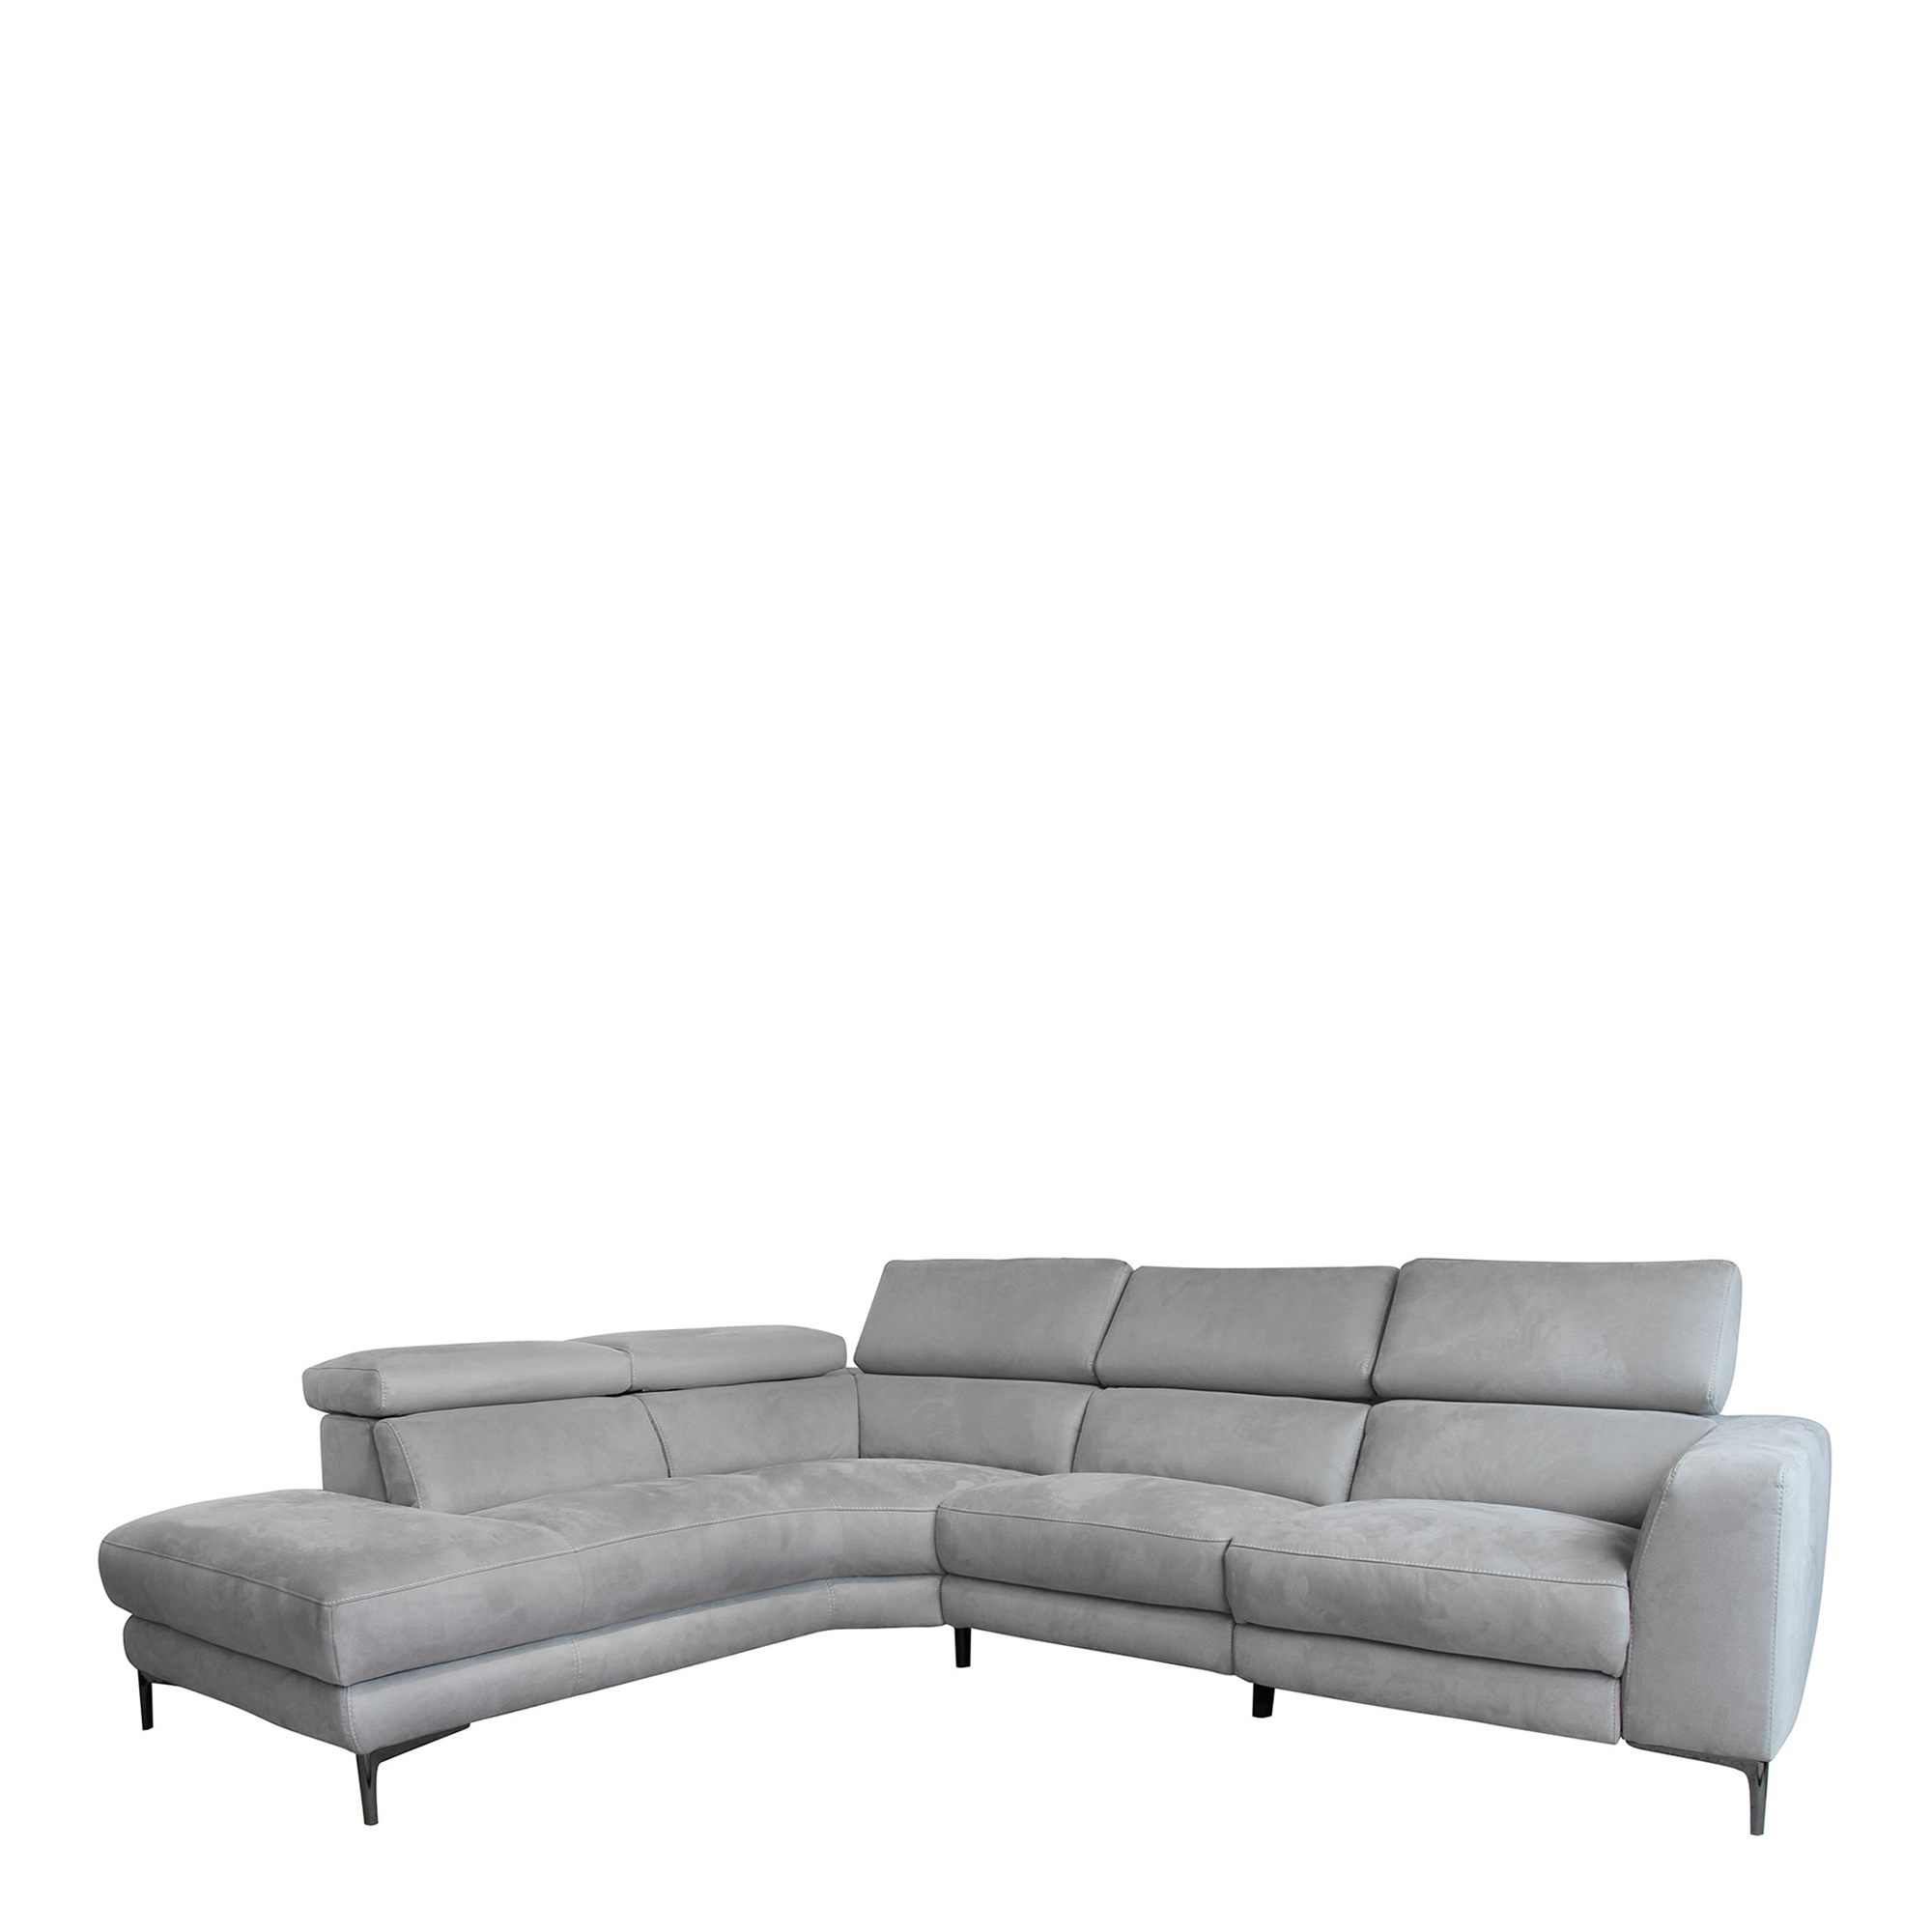 bella 2 5 seat rhf power recliner corner group